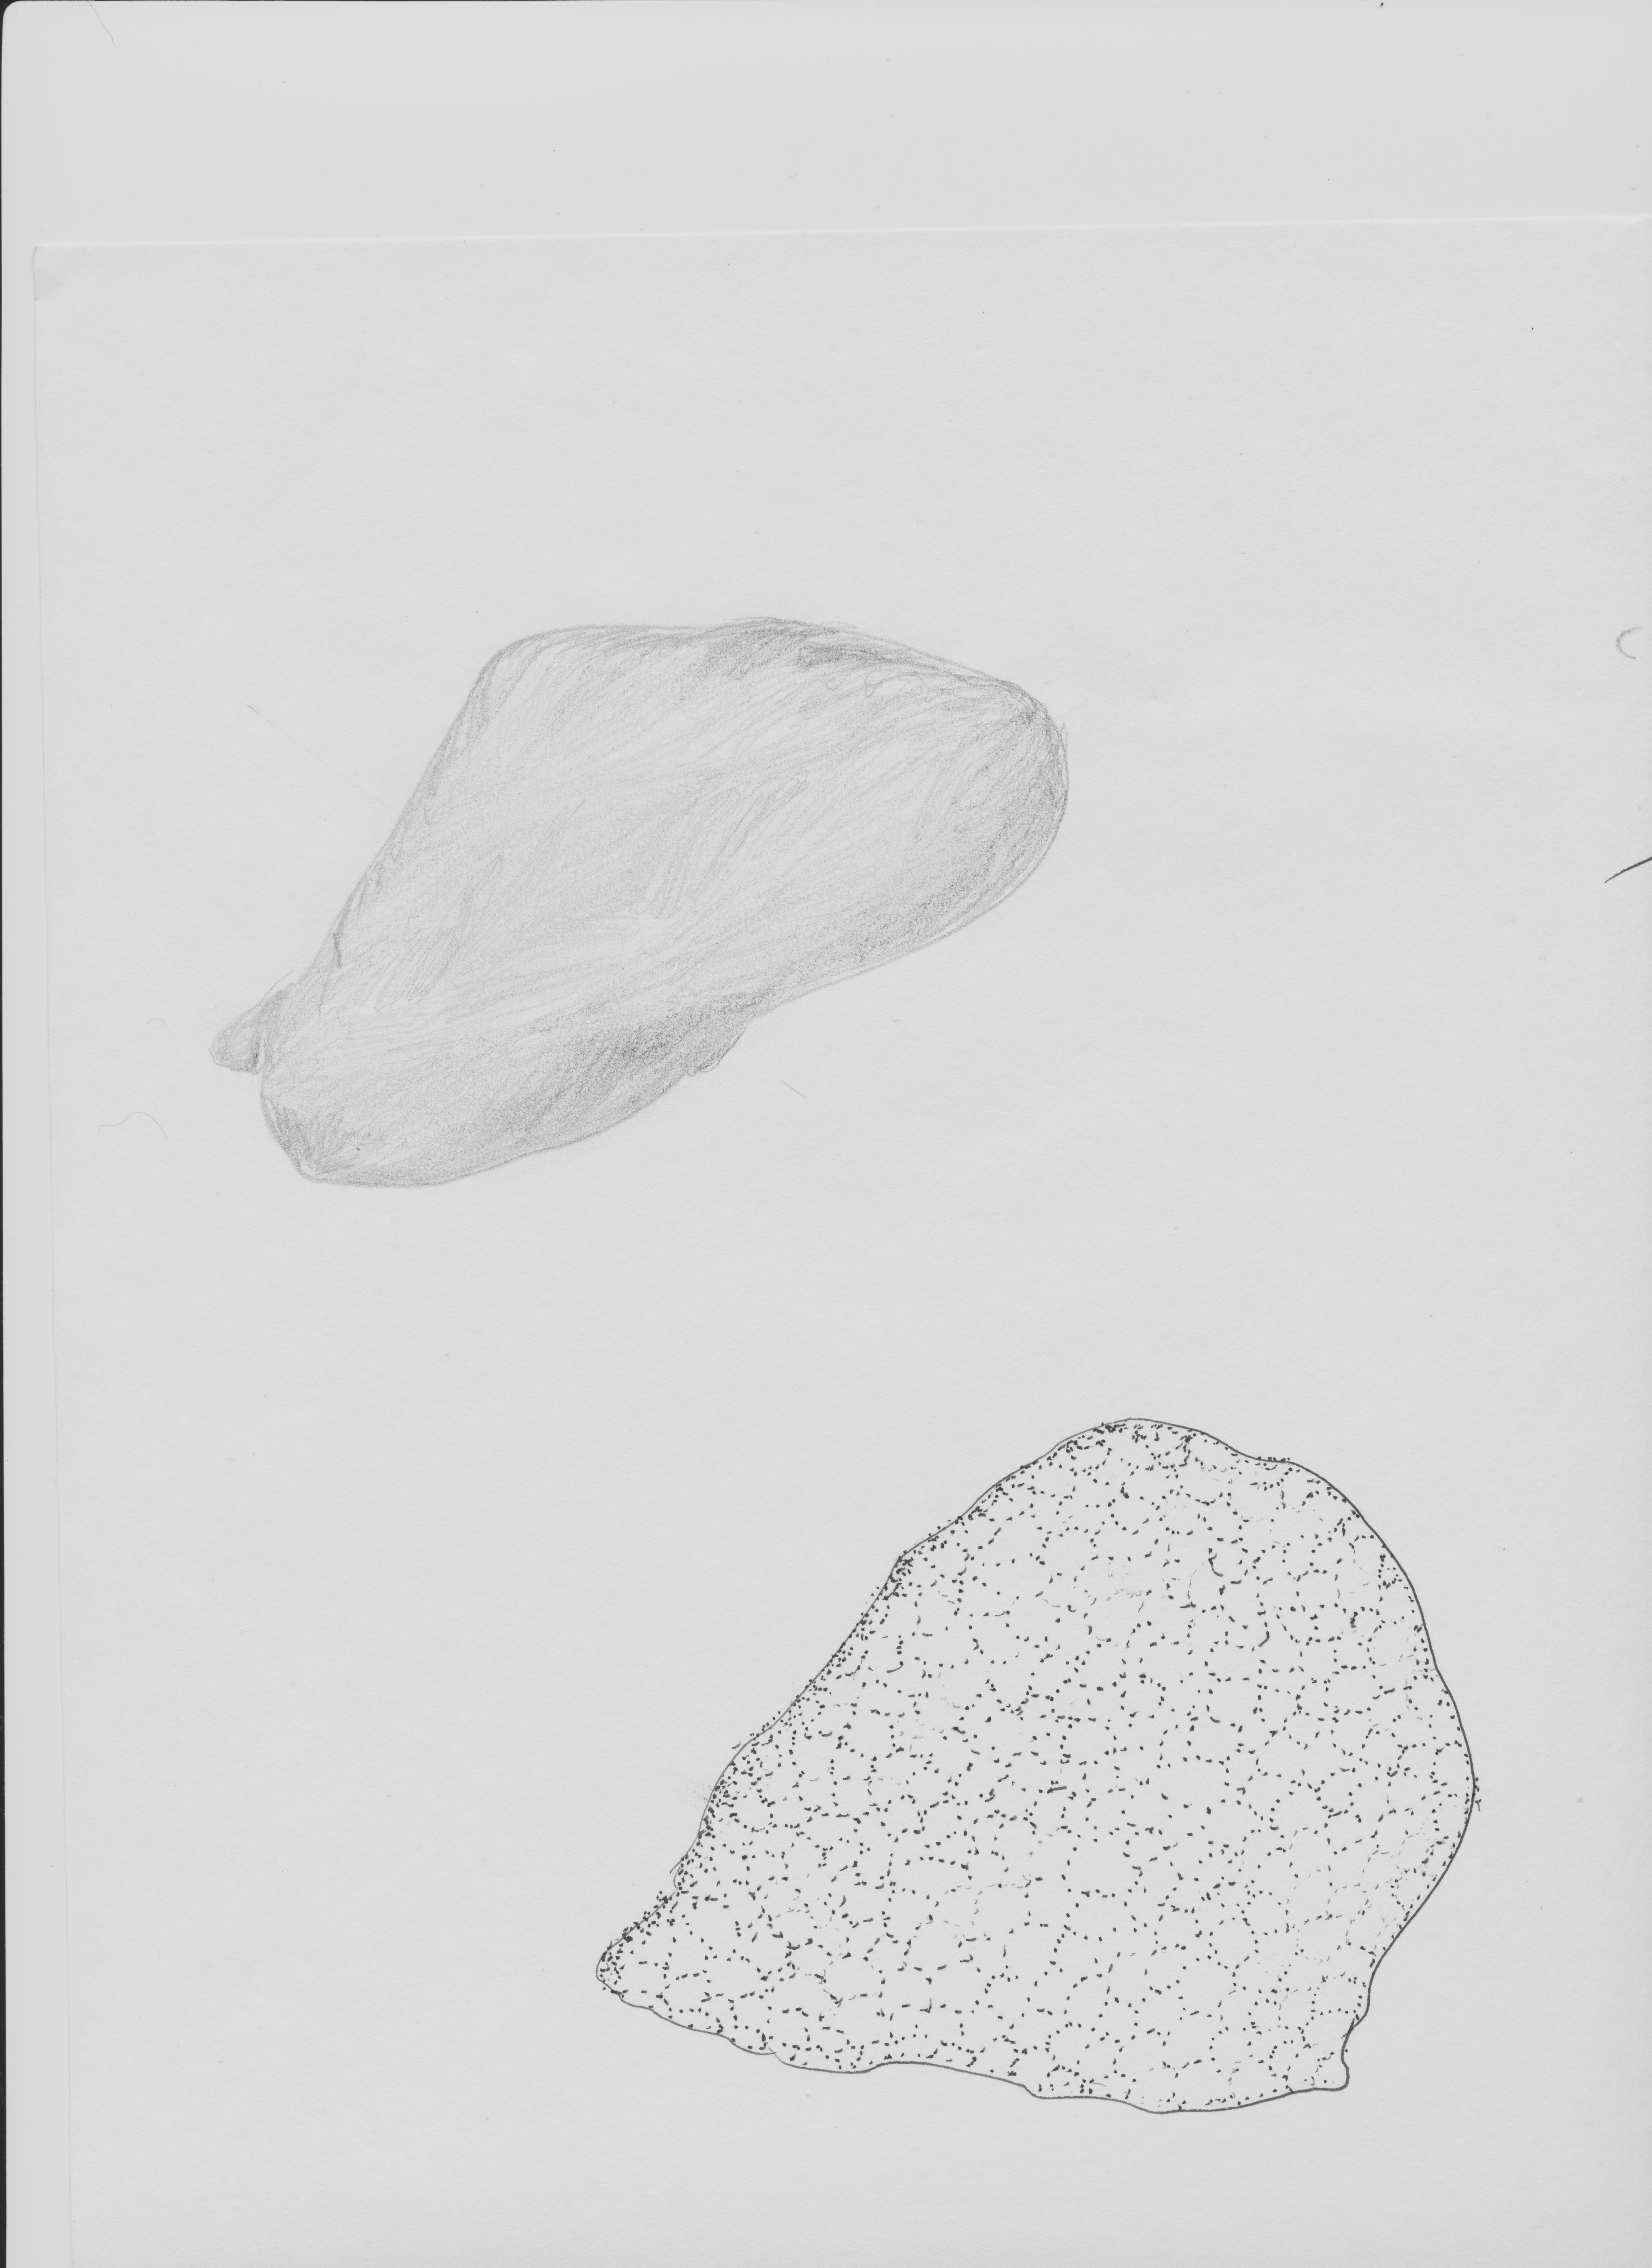 Image of placozoans